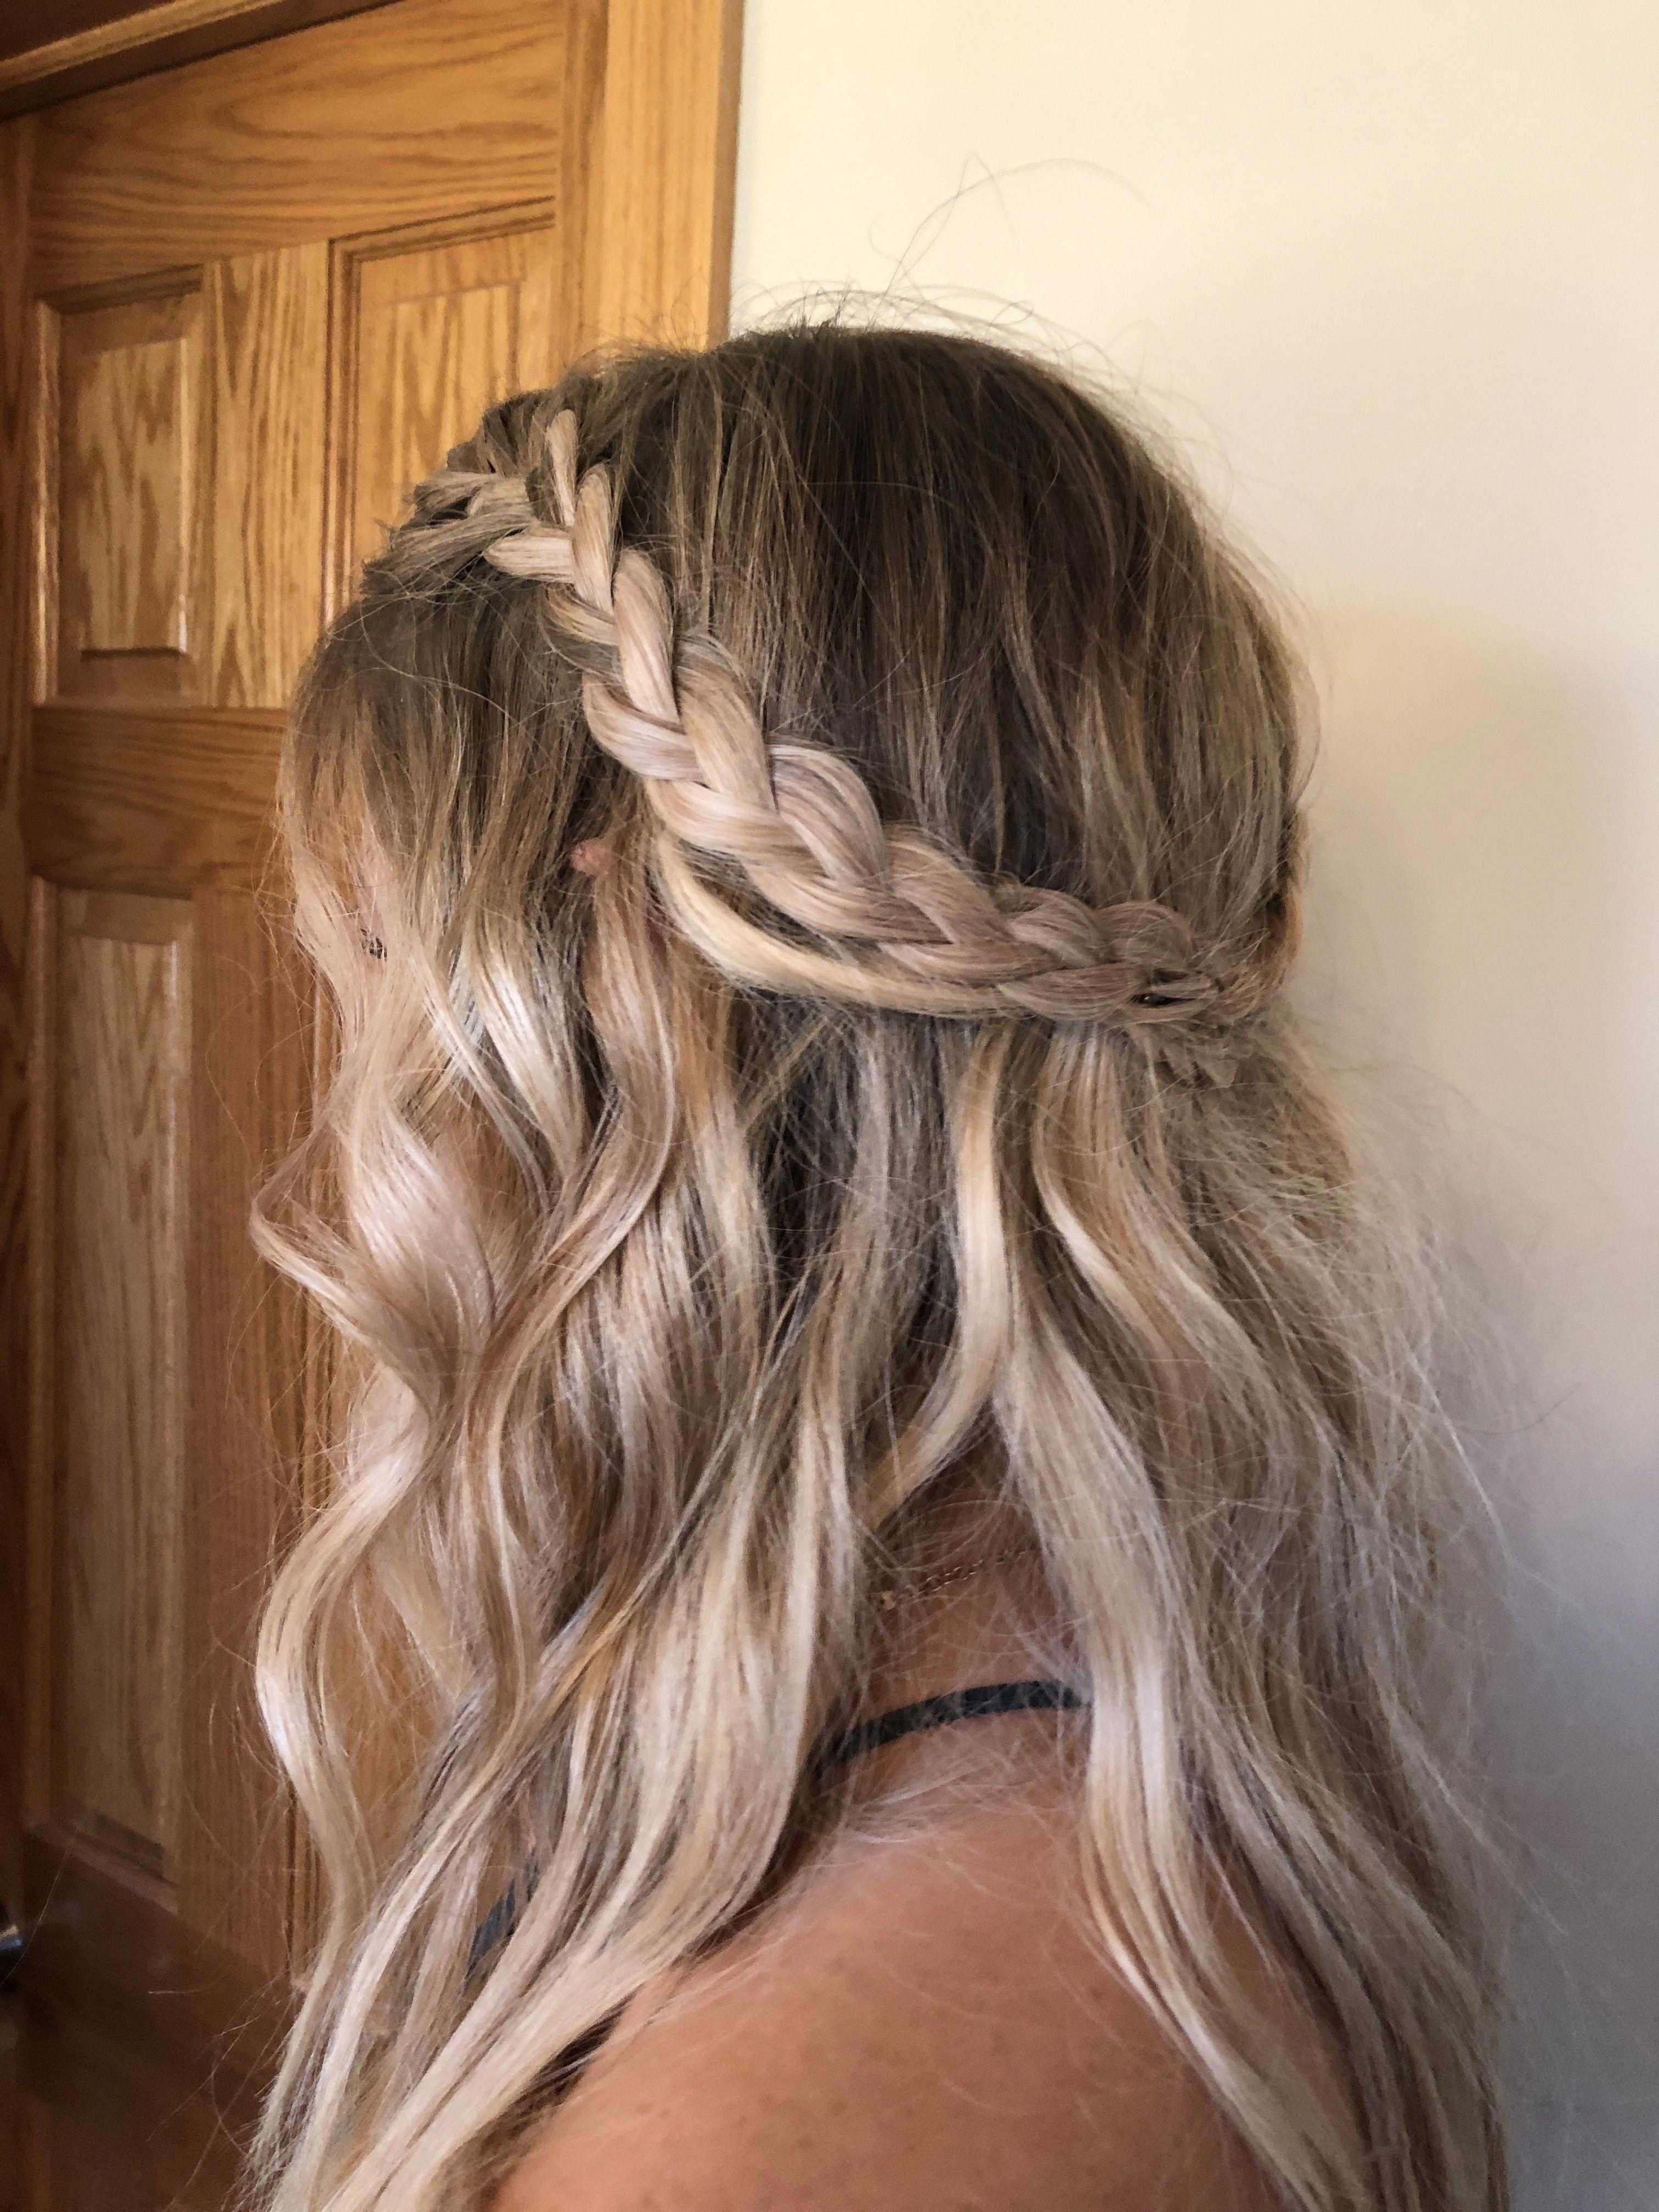 Braided Half Up Half Down Hairstyle Updospromhairstyles Prom Hair Down Wedding Hair Down Hair Down With Braid